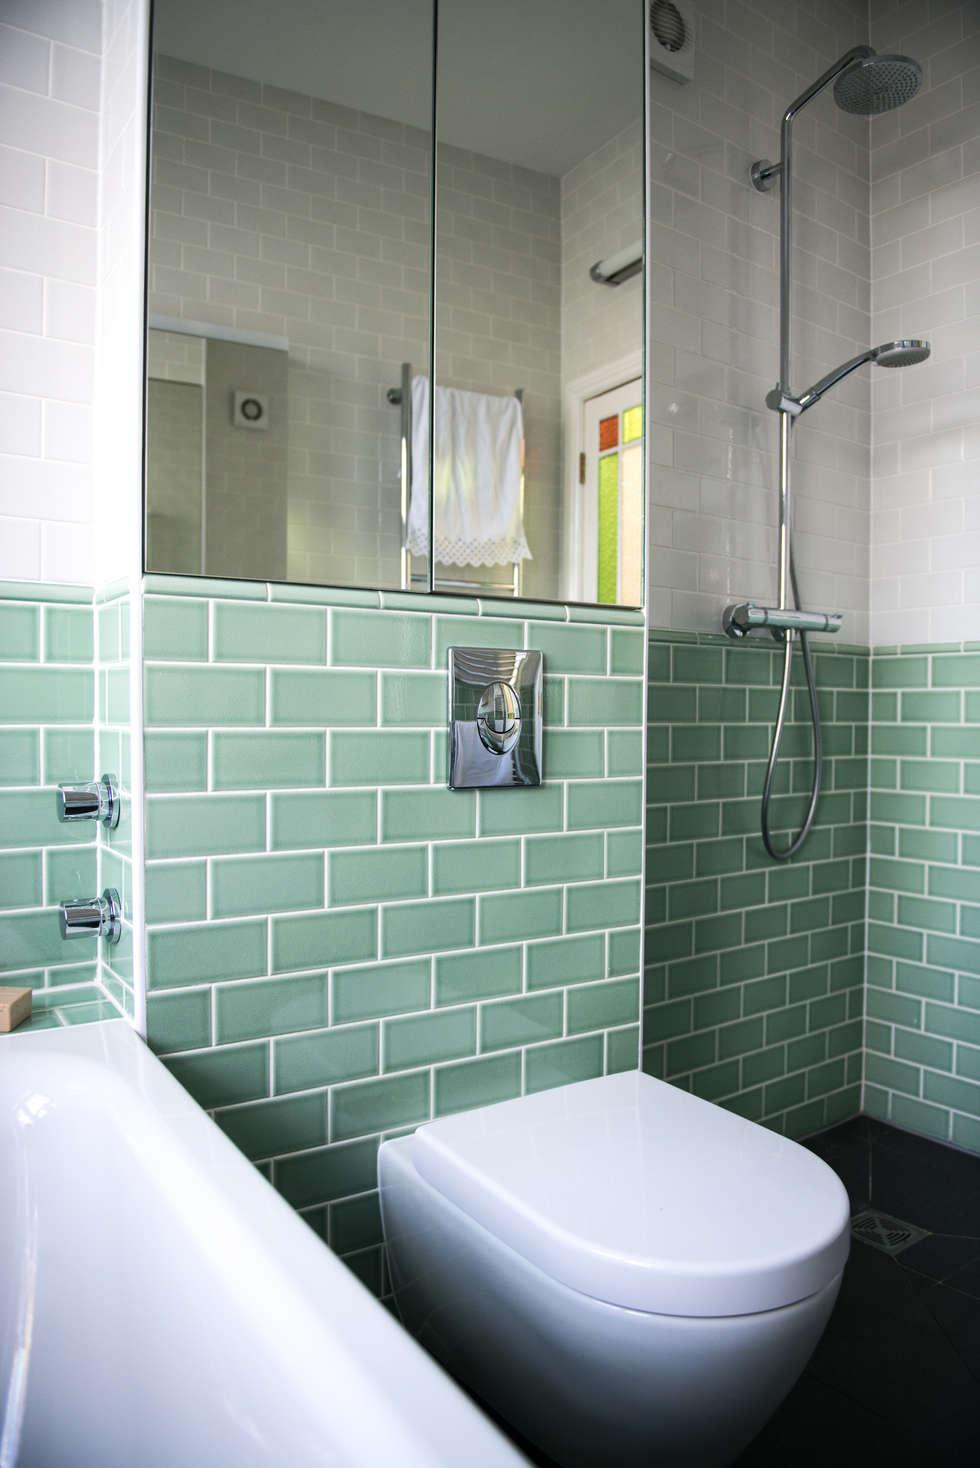 Interior design ideas redecorating remodeling photos for Duck egg blue bathroom ideas